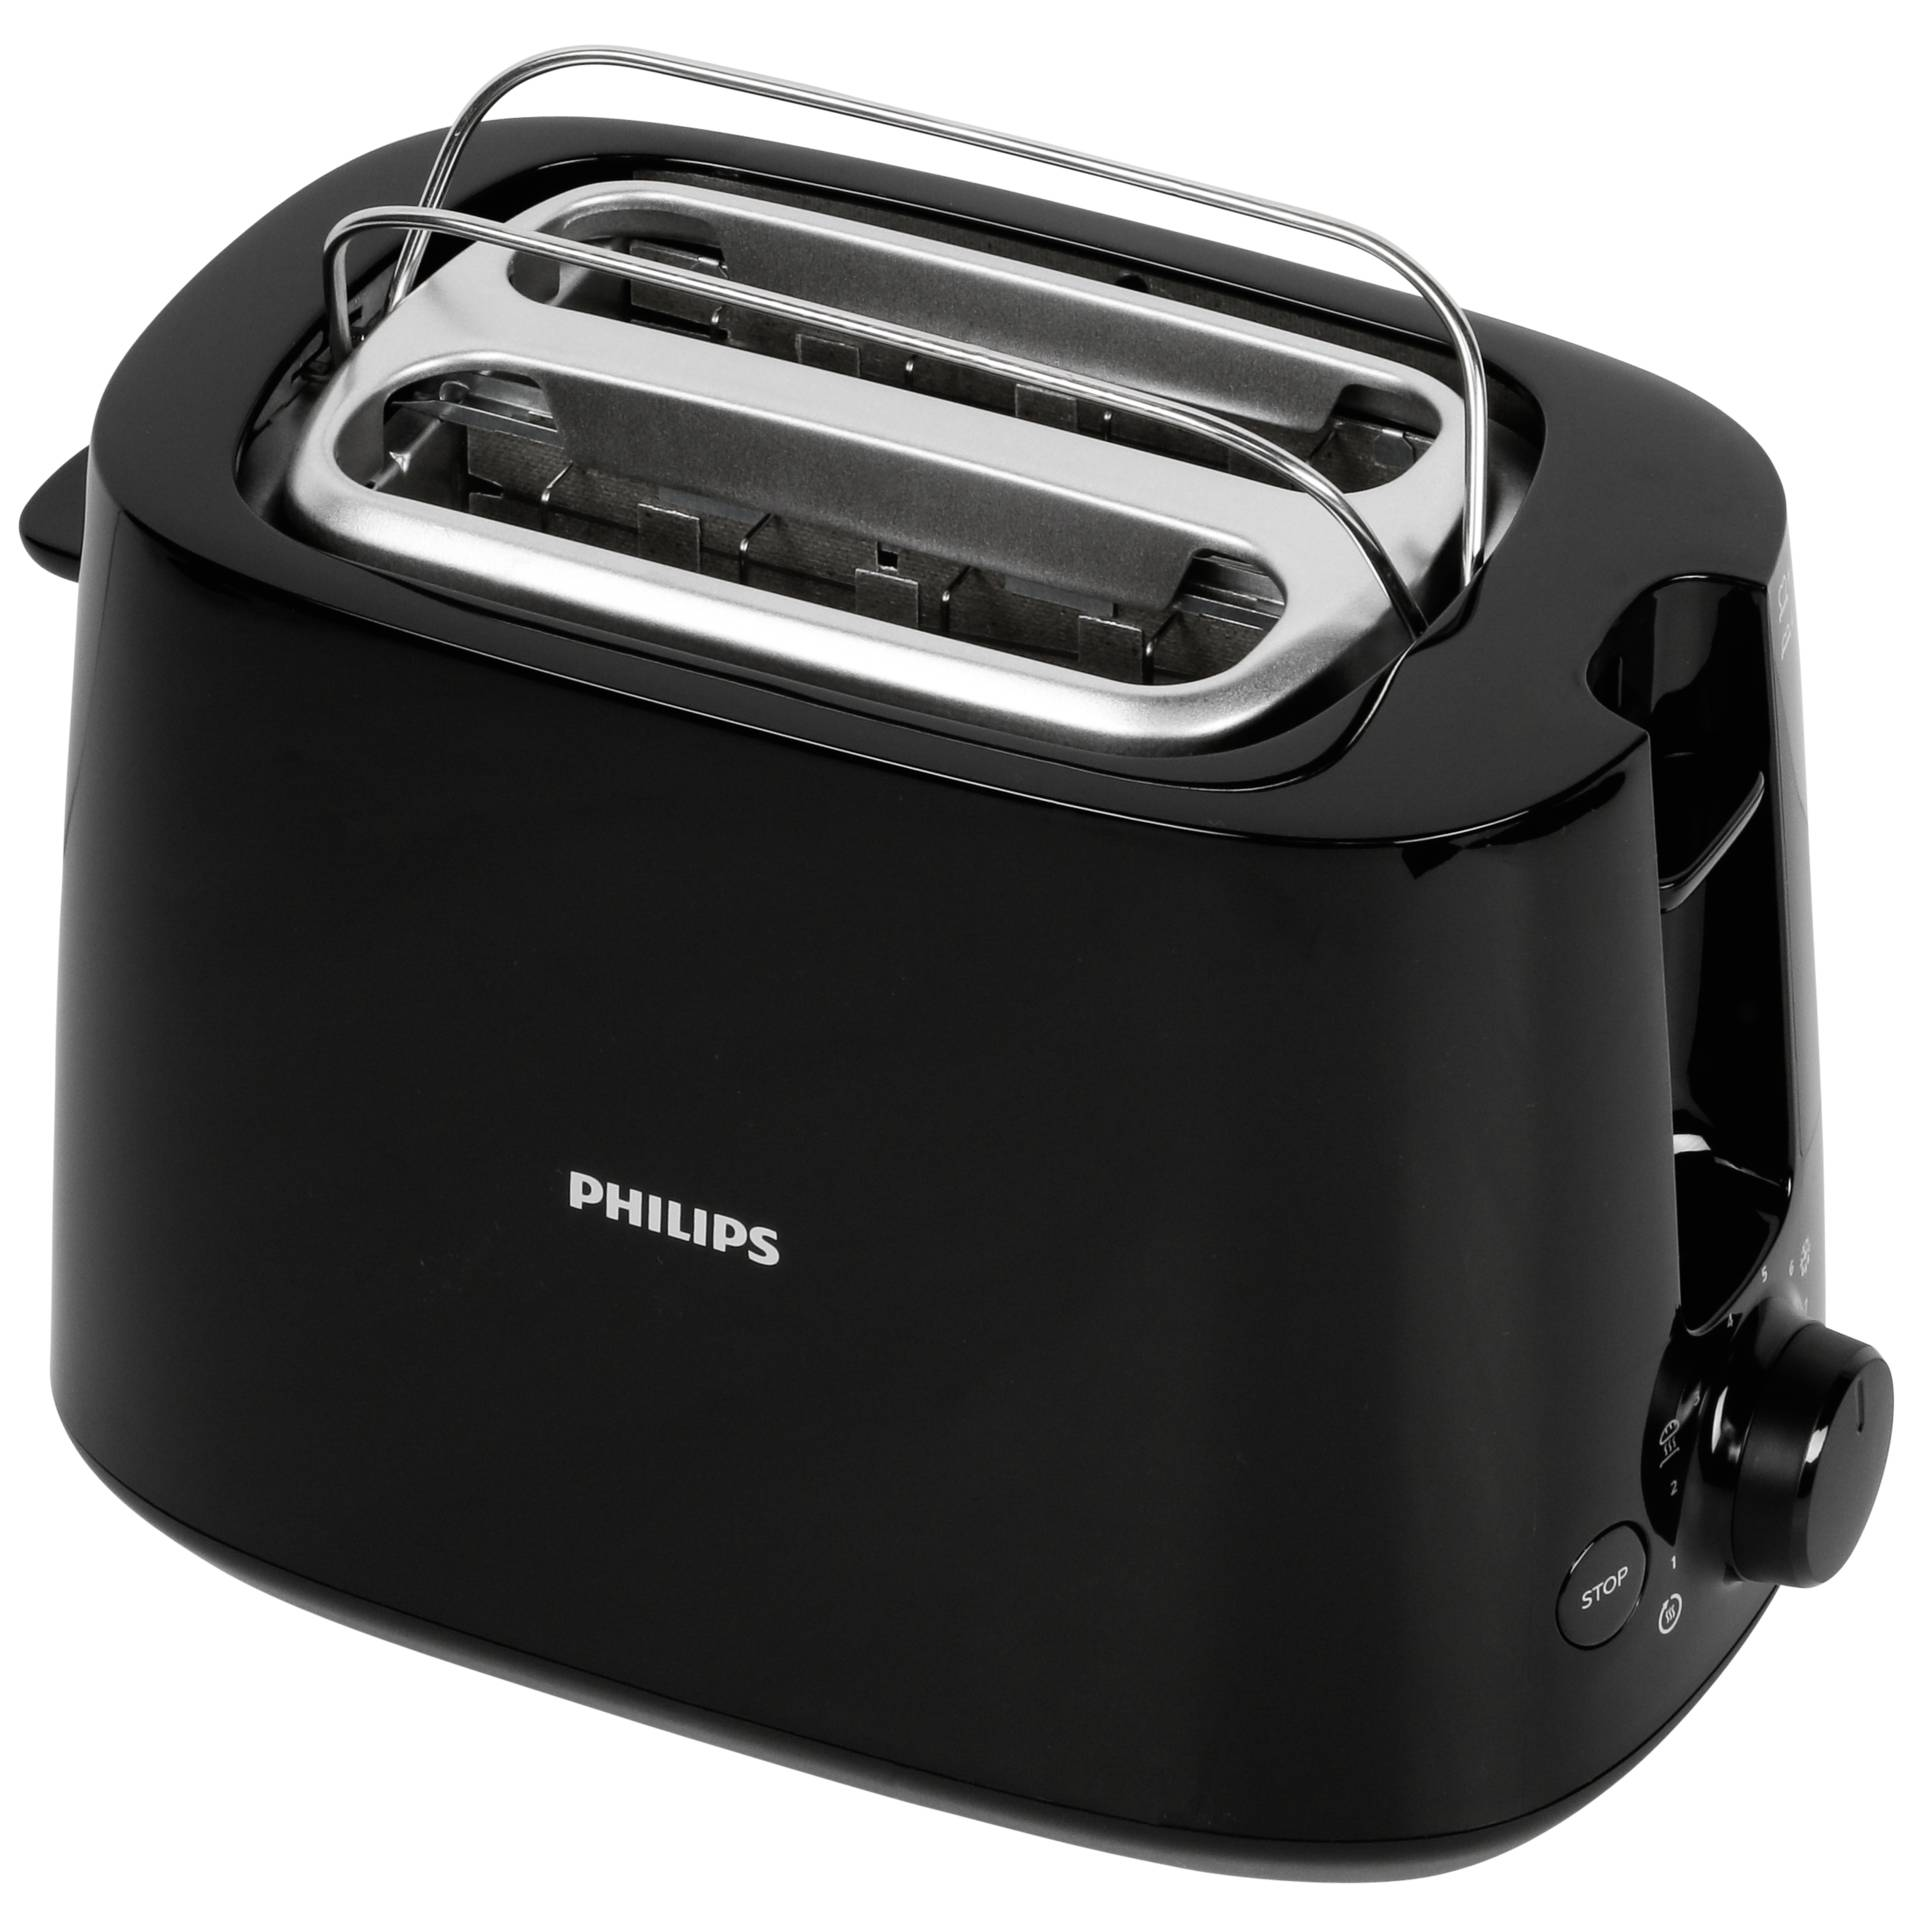 Philips HD 2581/90